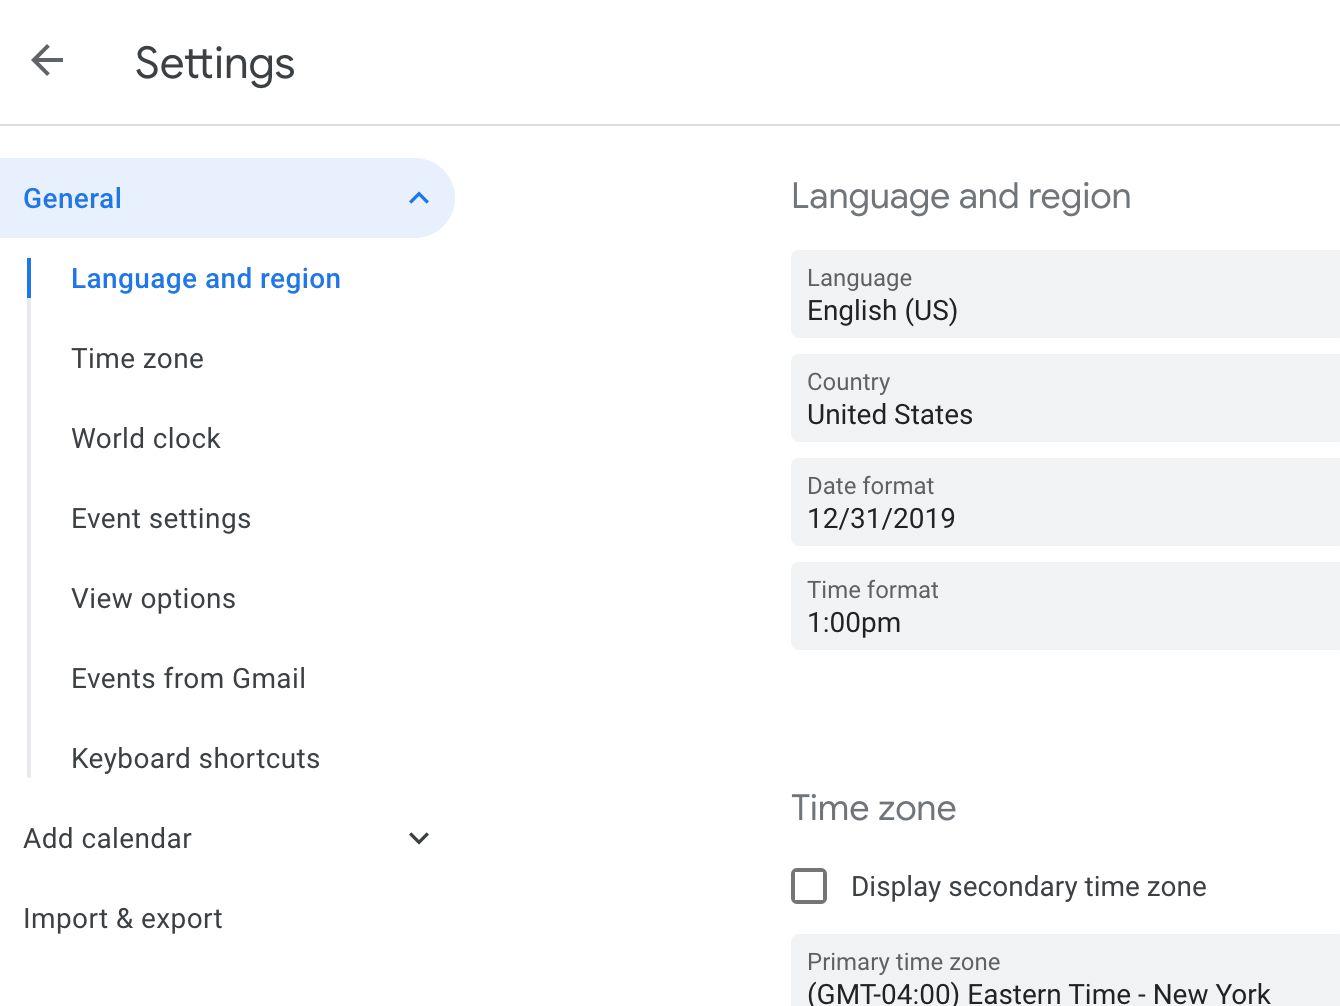 How to Import ICS Calendar Files